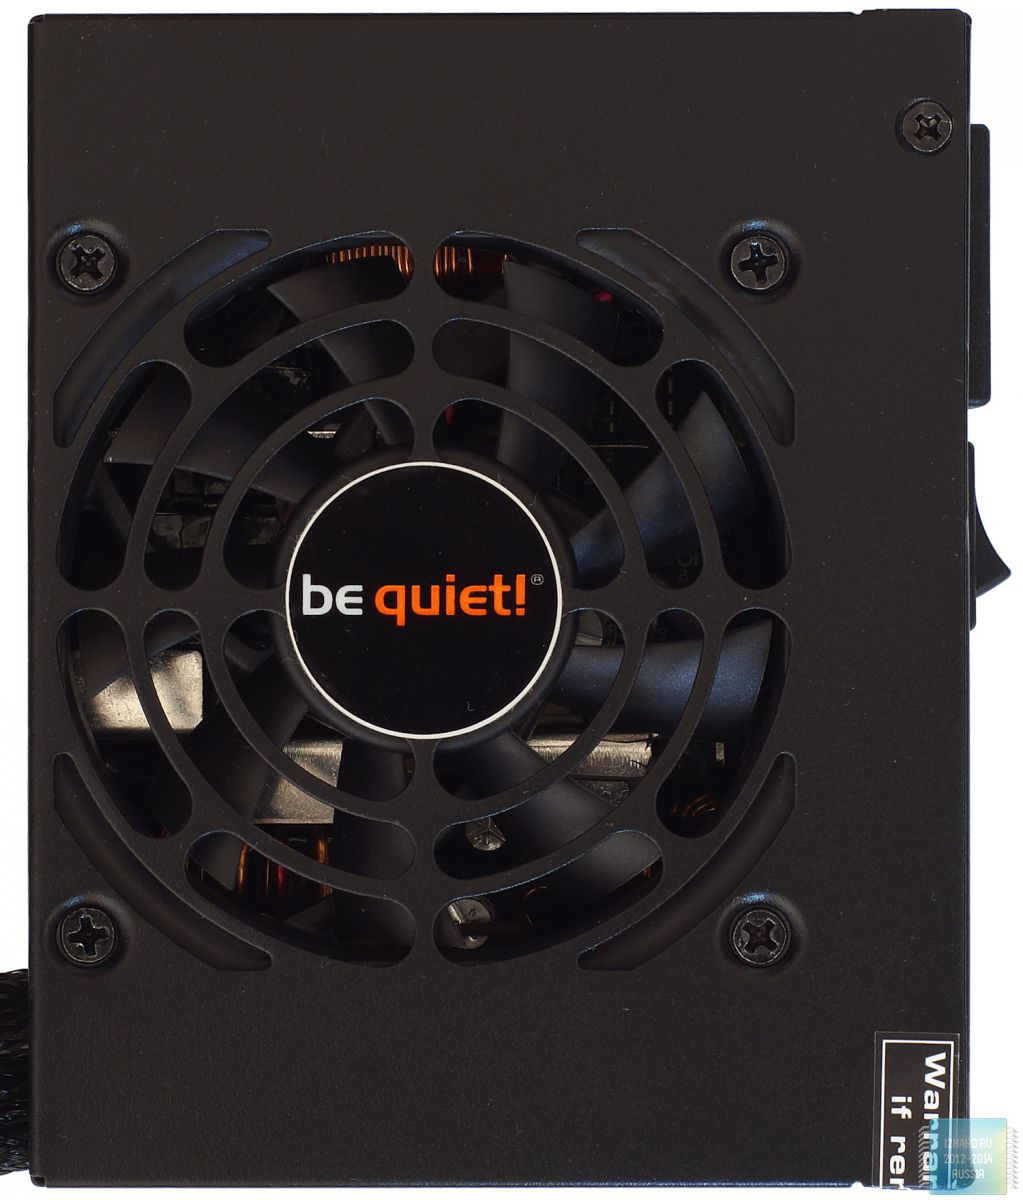 Внешний вид блока питания be quiet! SFX Power 2 400W